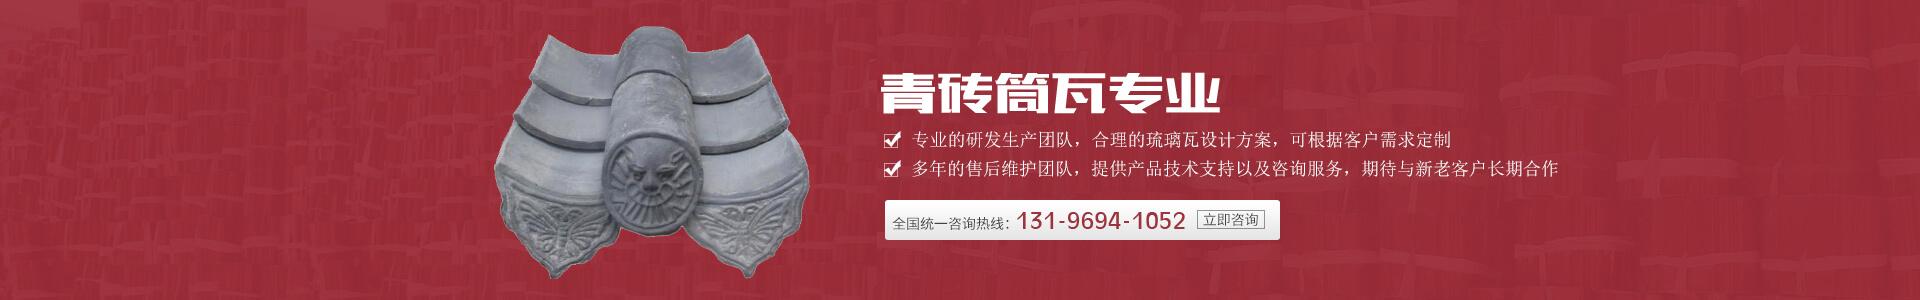 raybet雷竞技客户端raybet雷竞技app专业制作